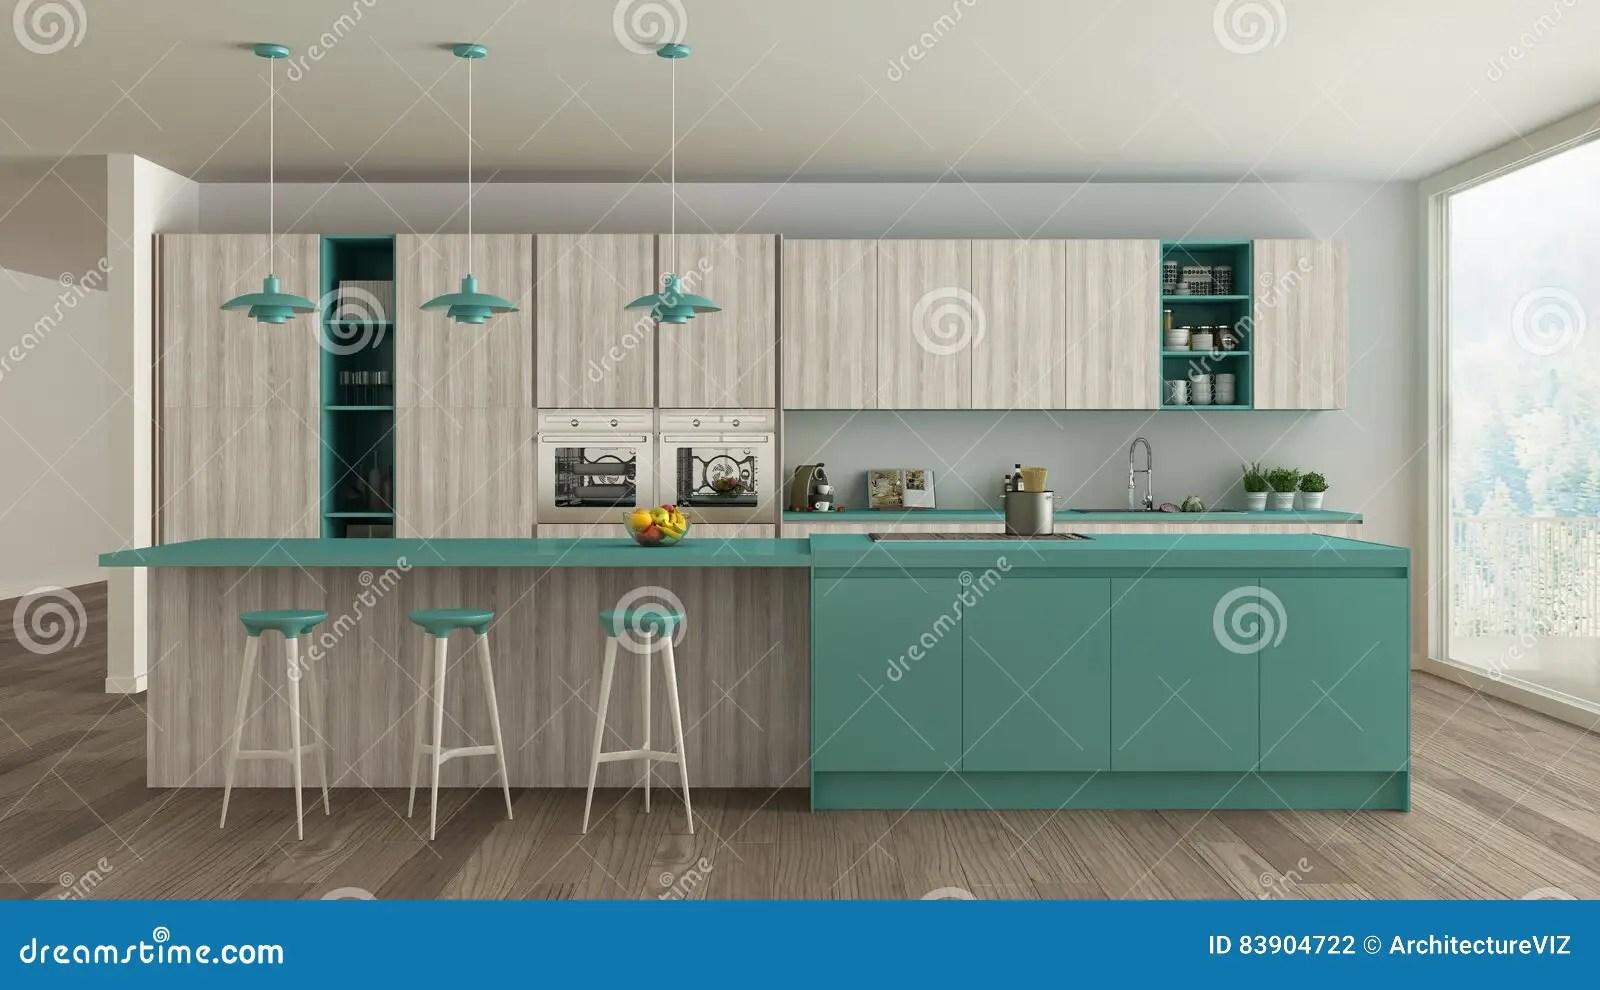 turquoise kitchen decor toy kitchens for toddlers 有木和绿松石细节的 mi斯堪的纳维亚白色厨房库存例证 插画包括有独有 minimalistic室内设计斯堪的纳维亚白色厨房